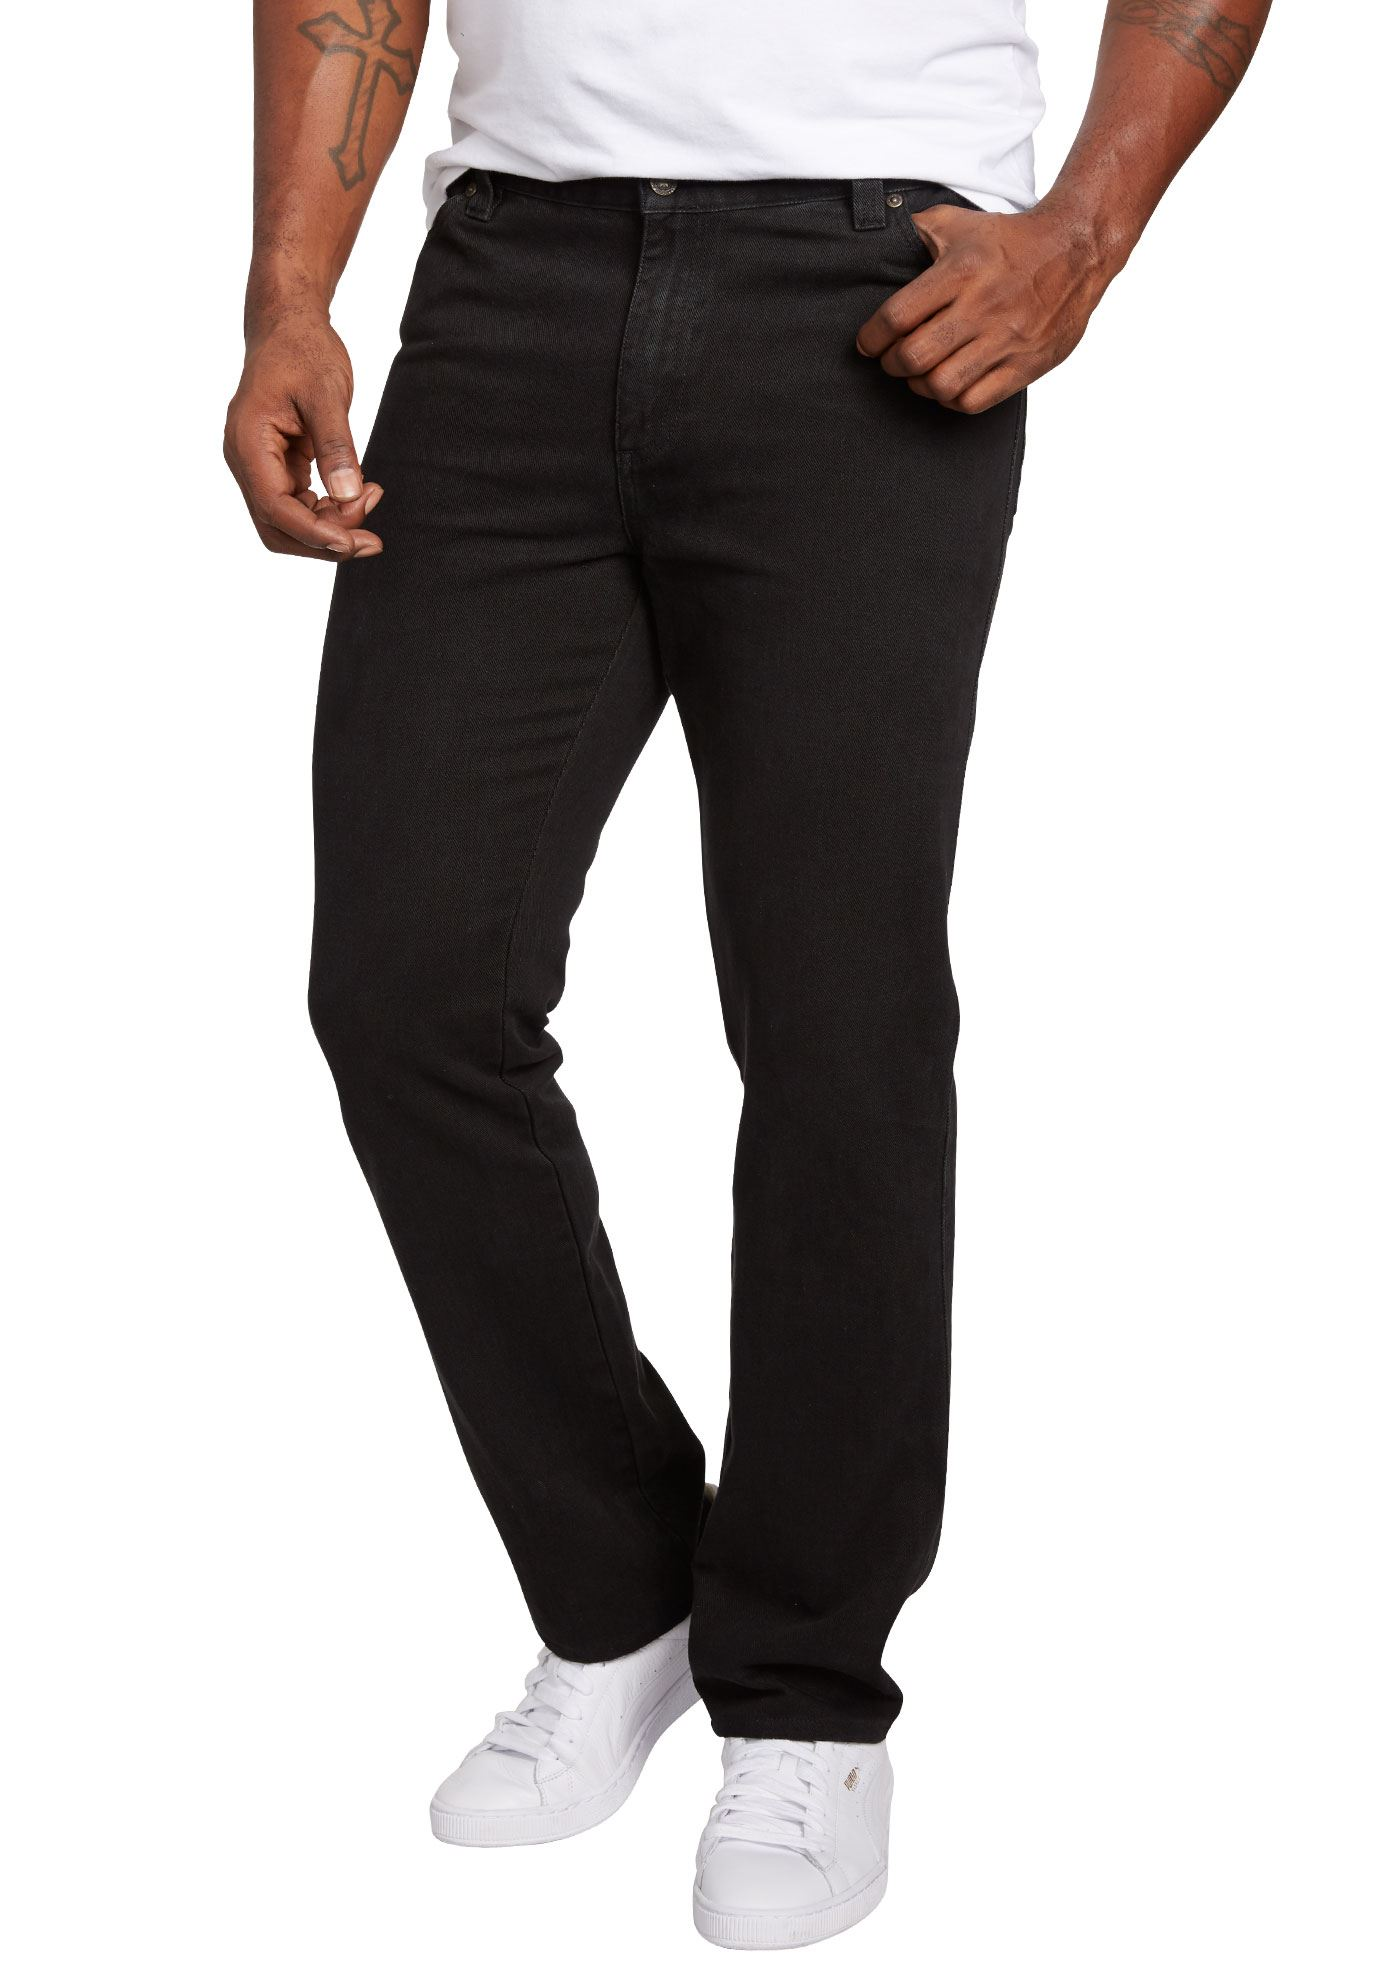 Liberty Blues Men's Big & Tall Straight Fit Side Elastic 5-pocket Jeans